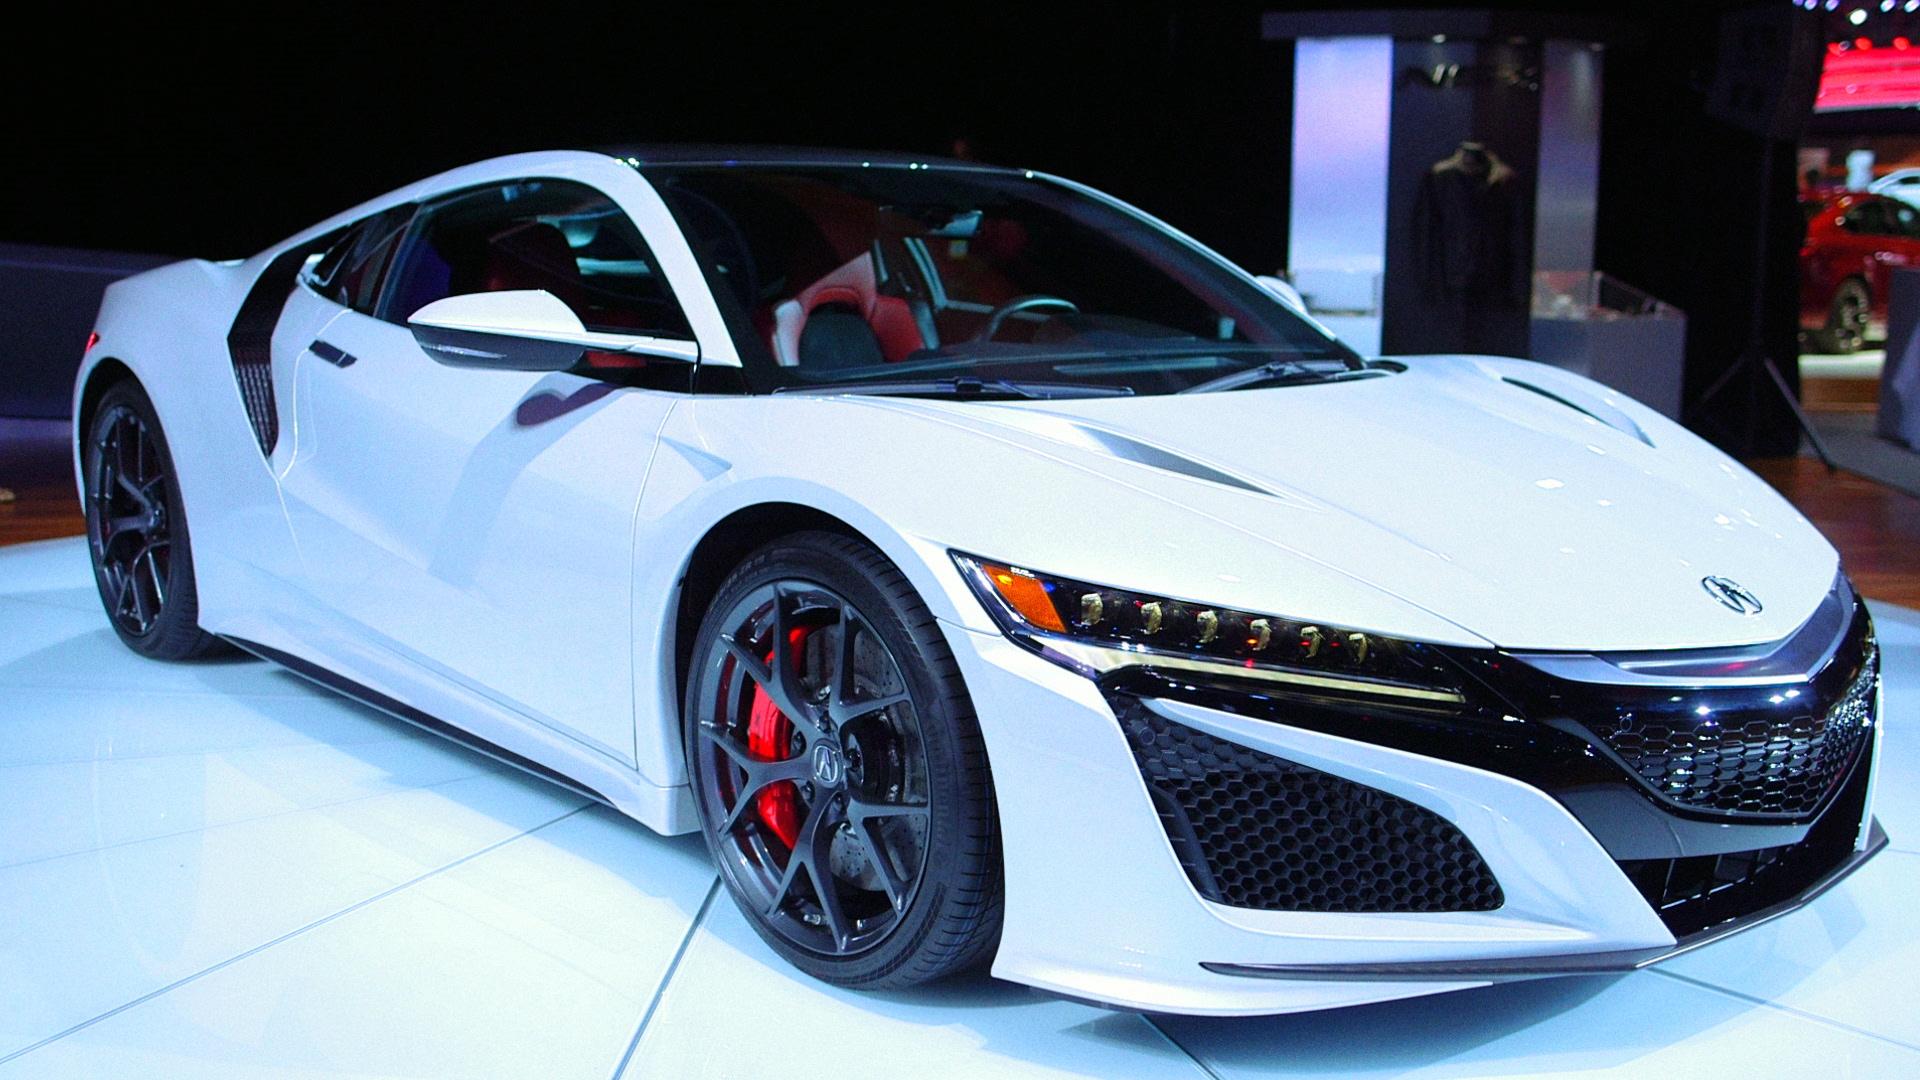 Luxury sports car photo